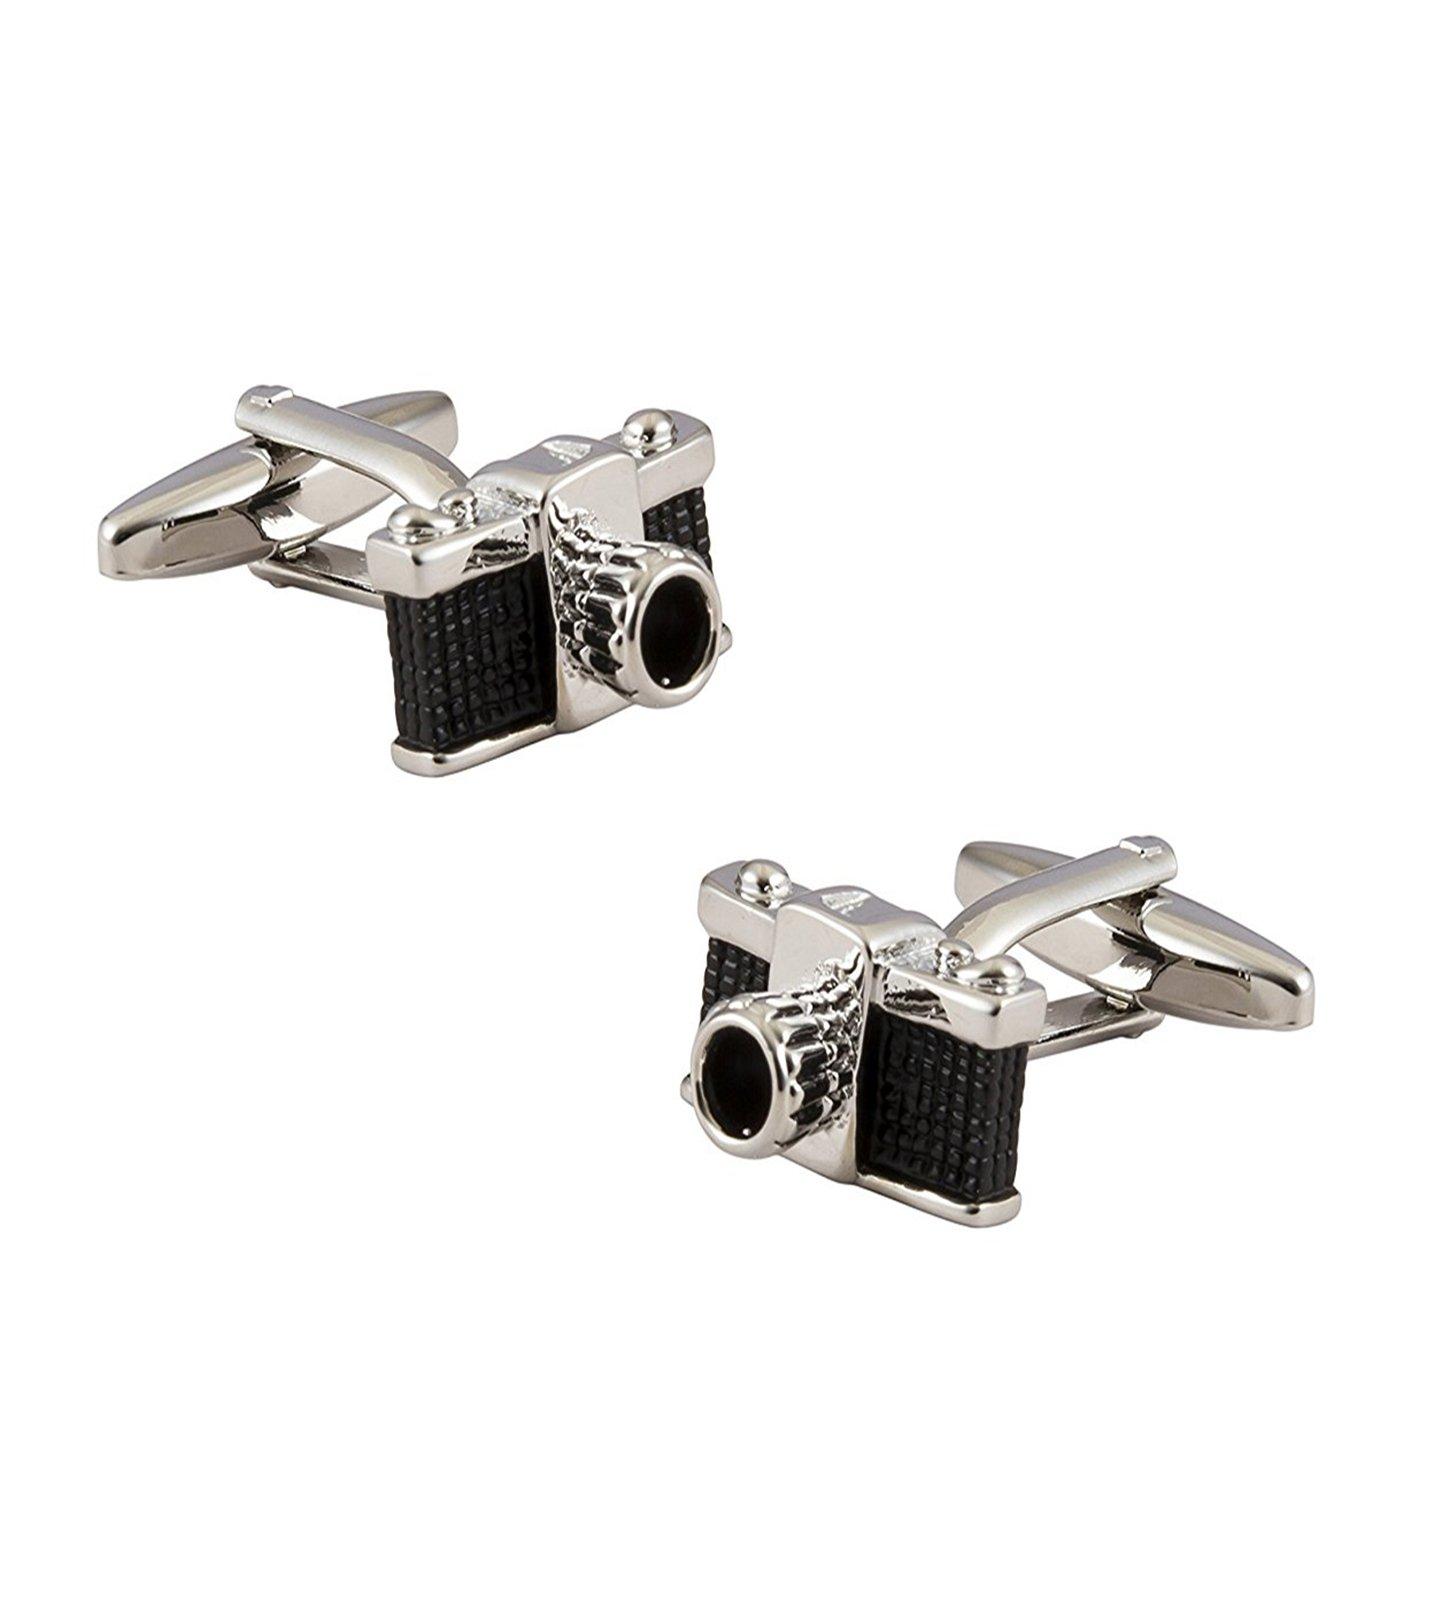 The Jewelbox Camera Black Rhodium Plated Brass Cufflink Formal Shirt Blazer Suit Cufflinks Pair Men Gift Box